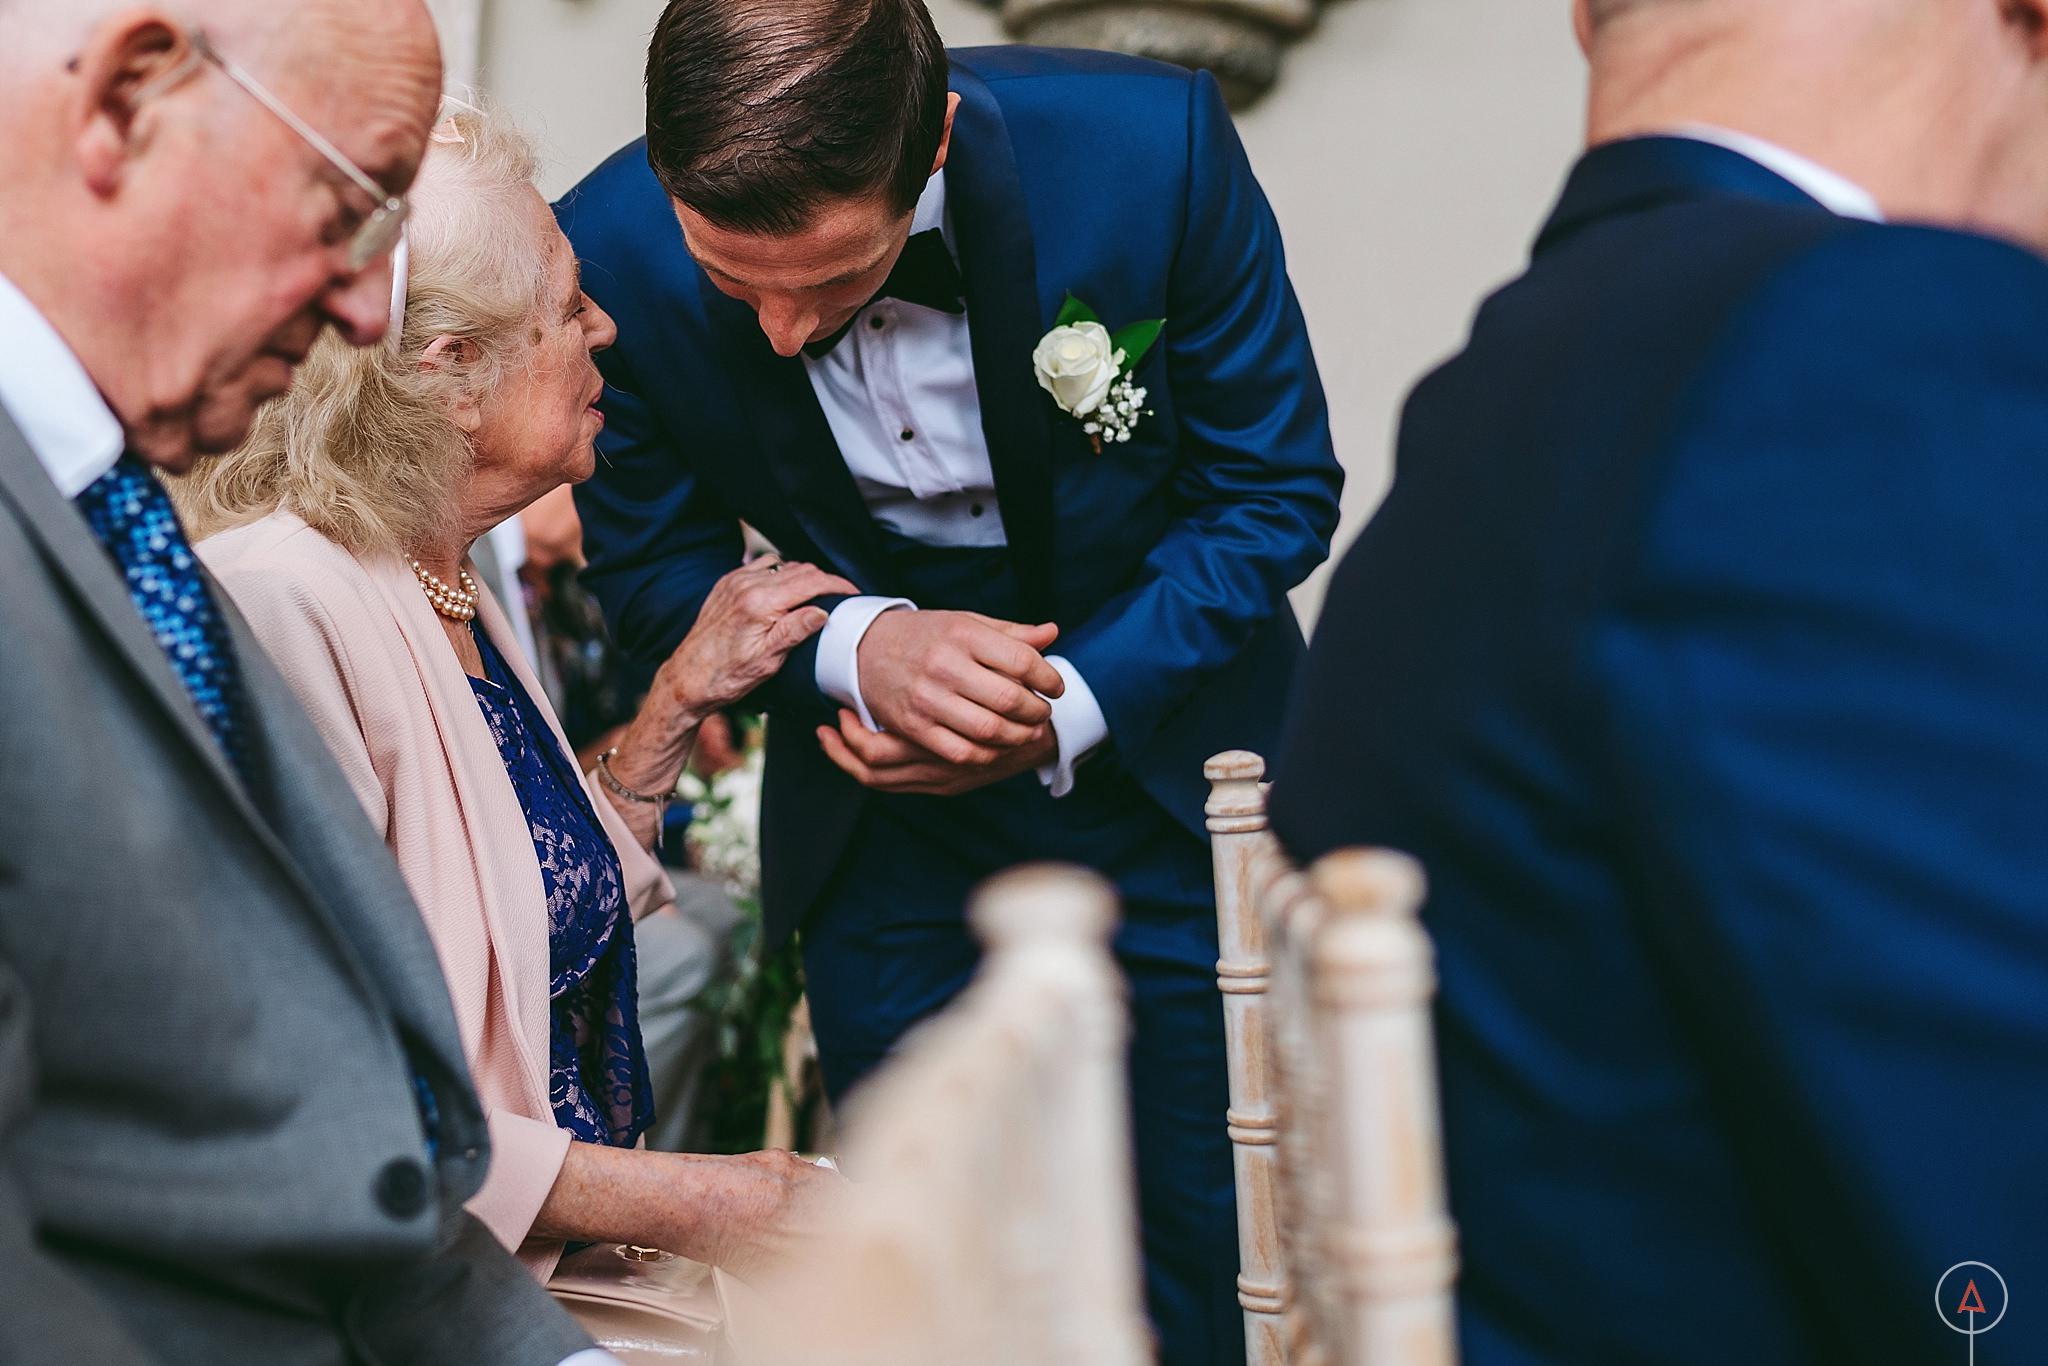 cardiff-wedding-photographer-aga-tomaszek_0244